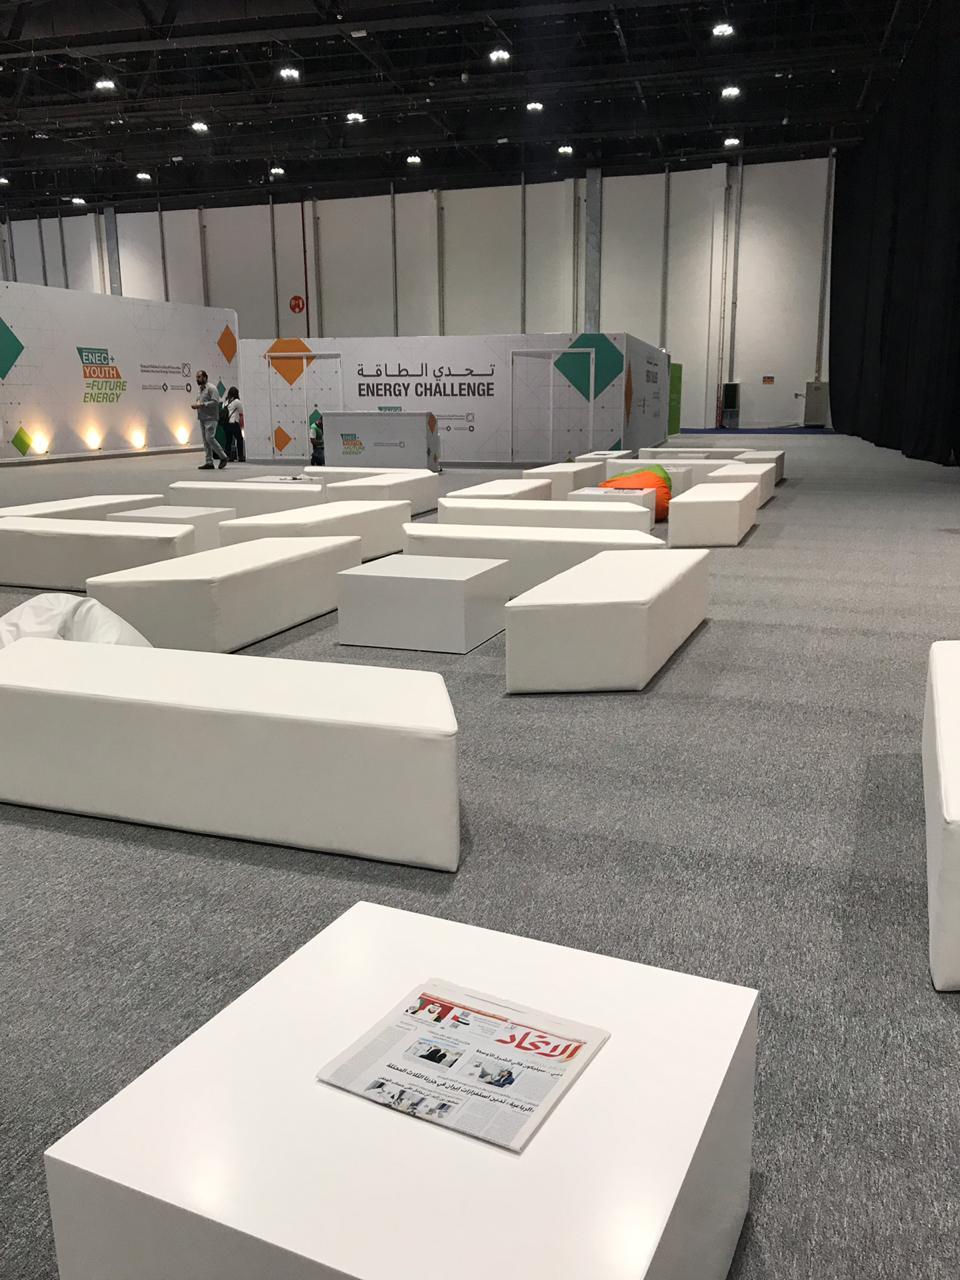 The 24th World Energy Congress - Abu Dhabi 2019